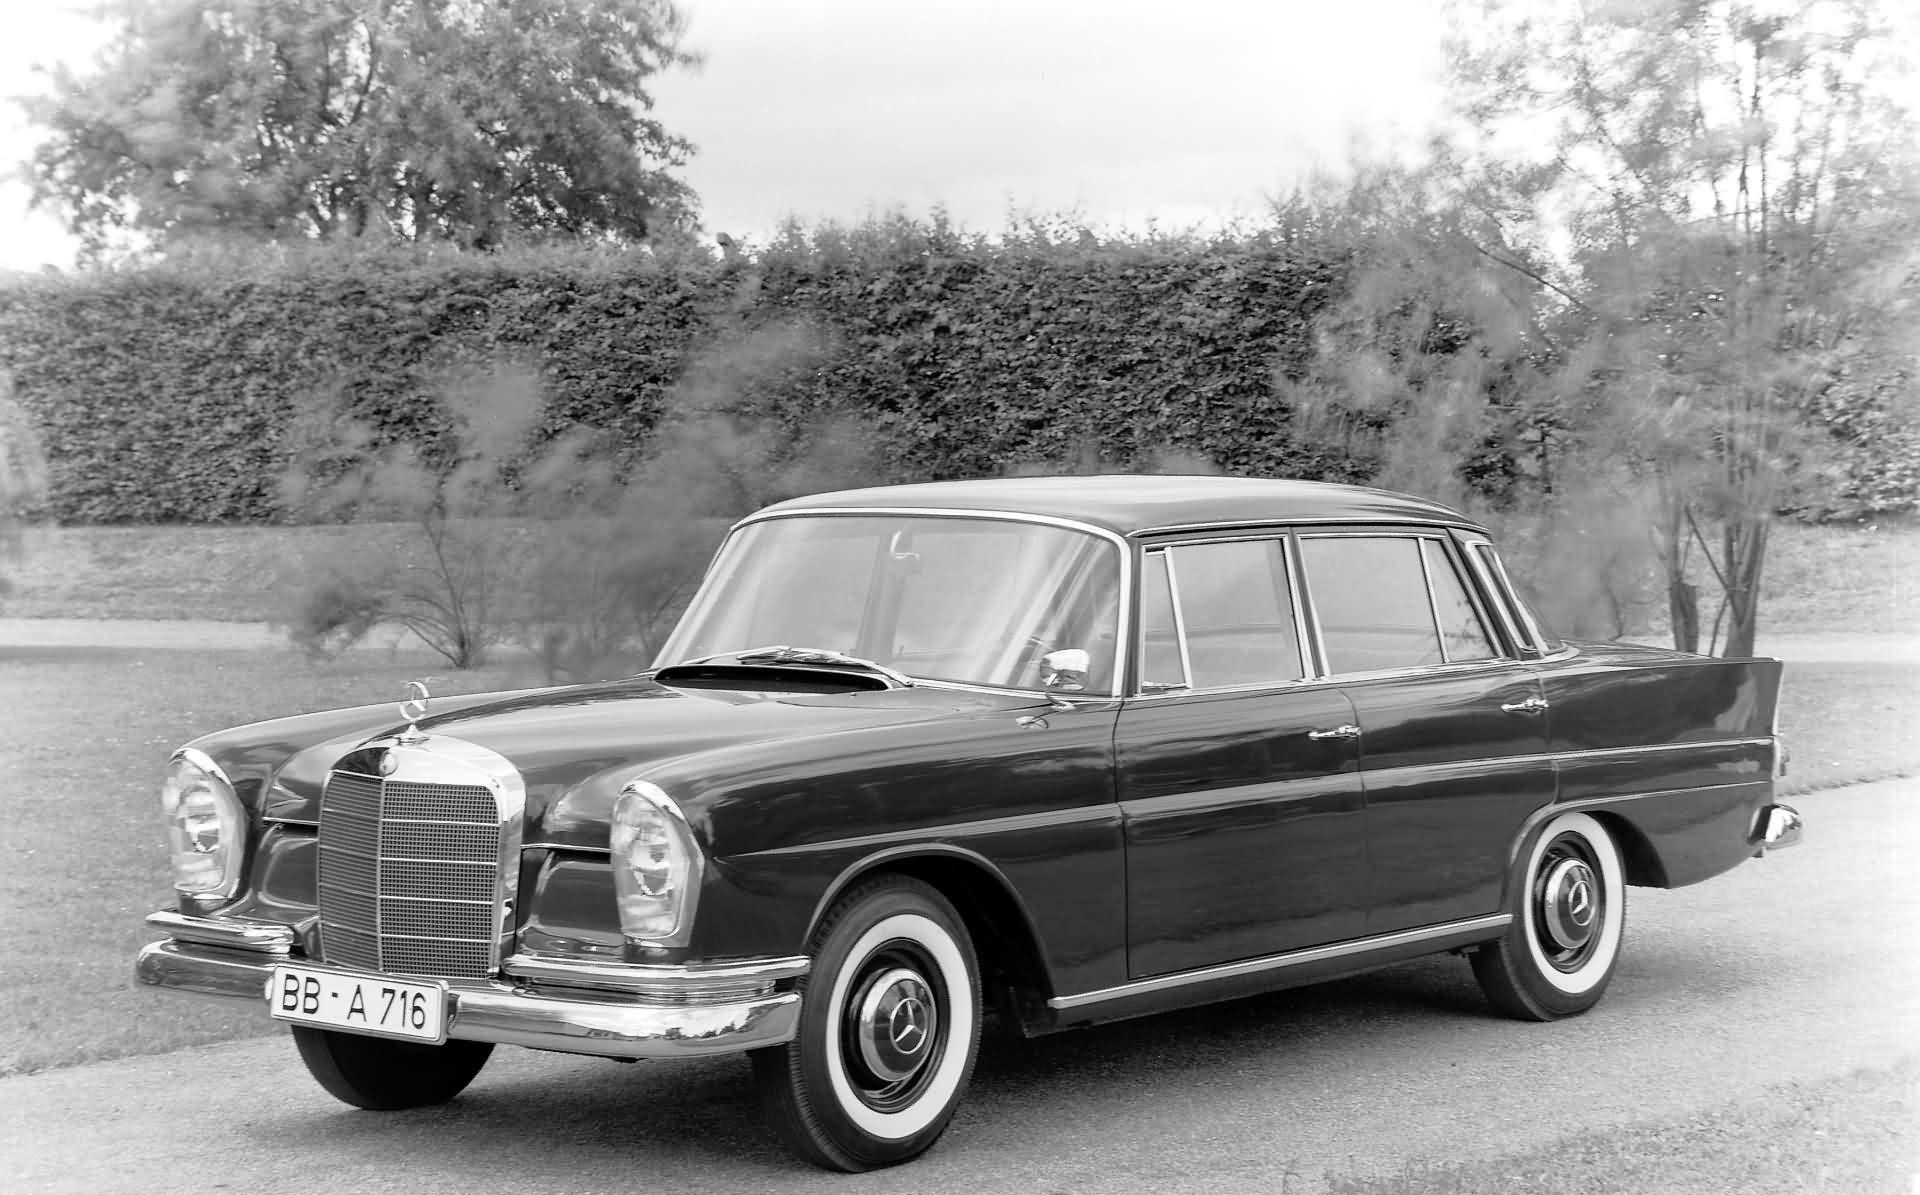 Mercedes-Benz 220 b W 111